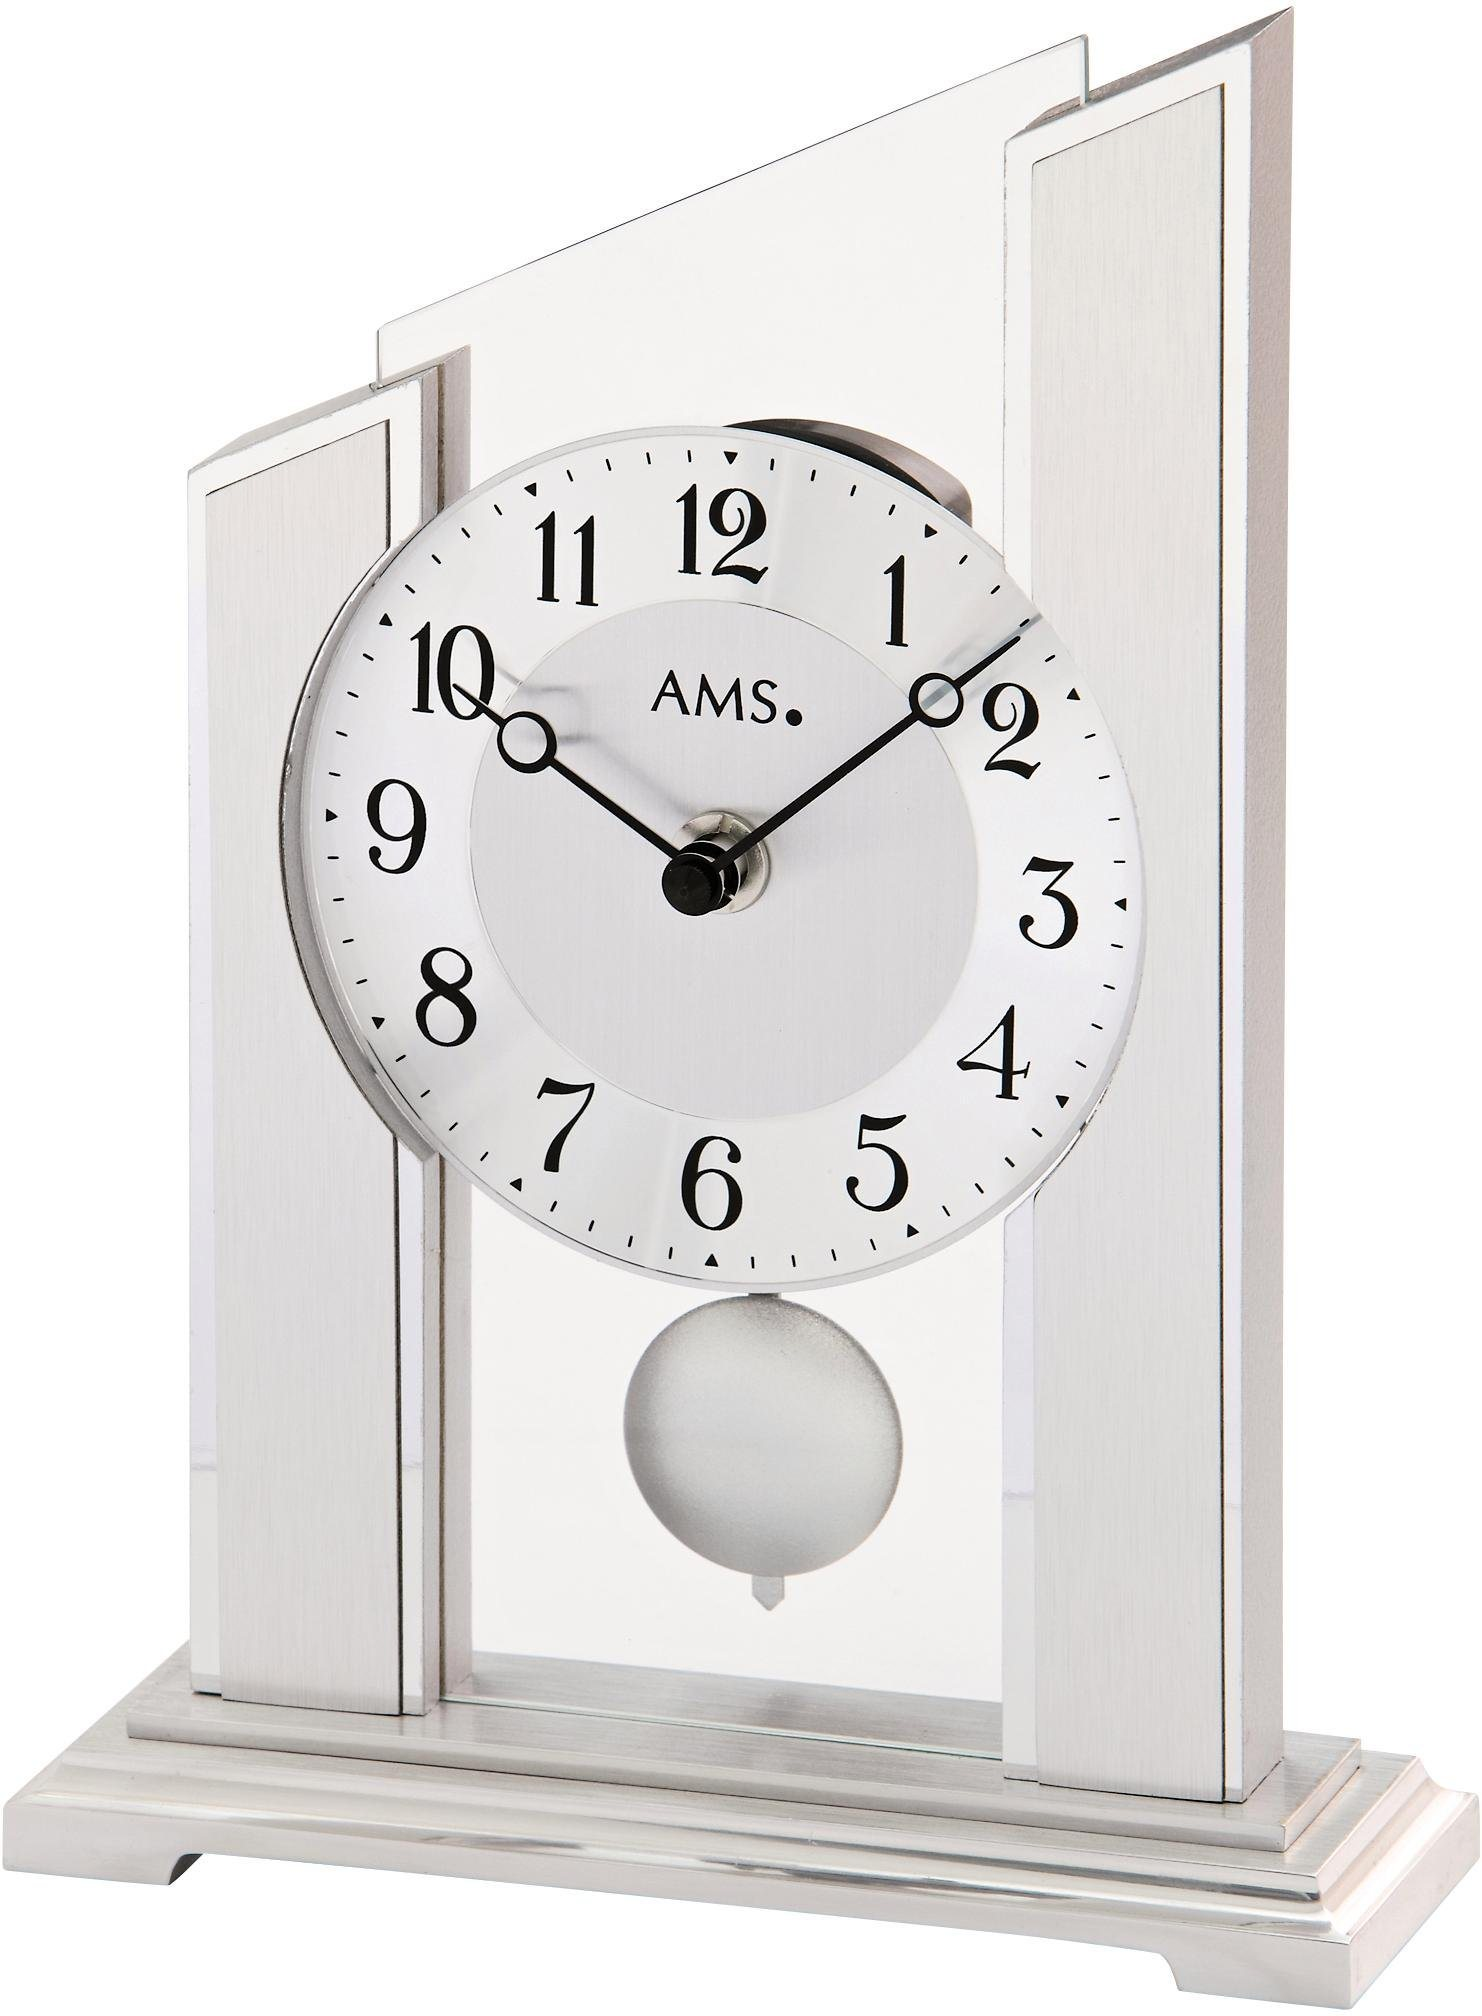 AMS Pendeltischuhr »T1169« | Dekoration > Uhren > Standuhren | Holz - Glas | AMS